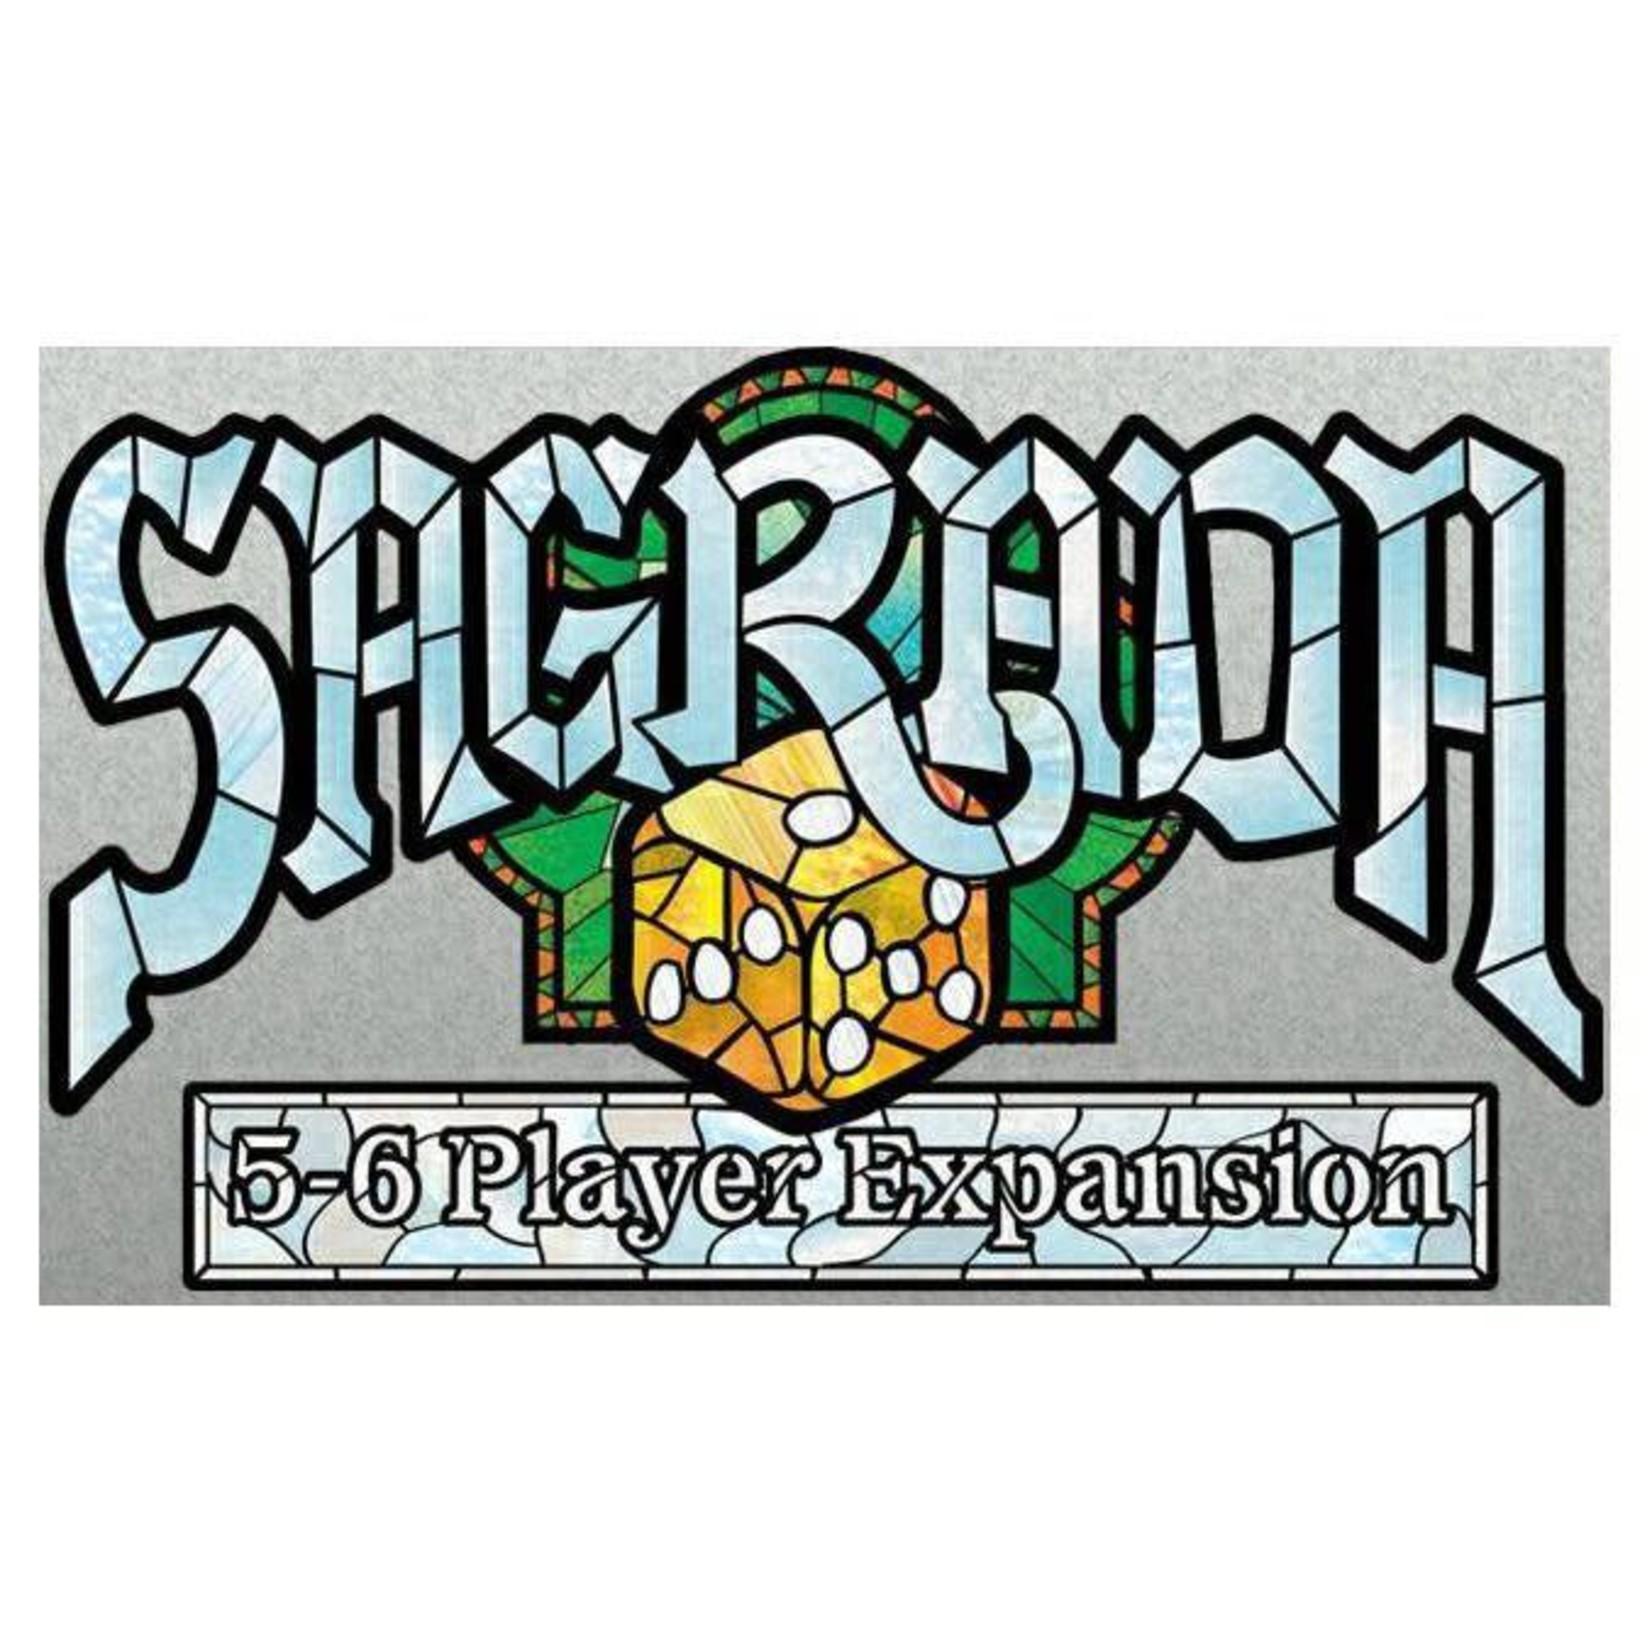 Floodgate Sagrada 5-6 Player Expansion